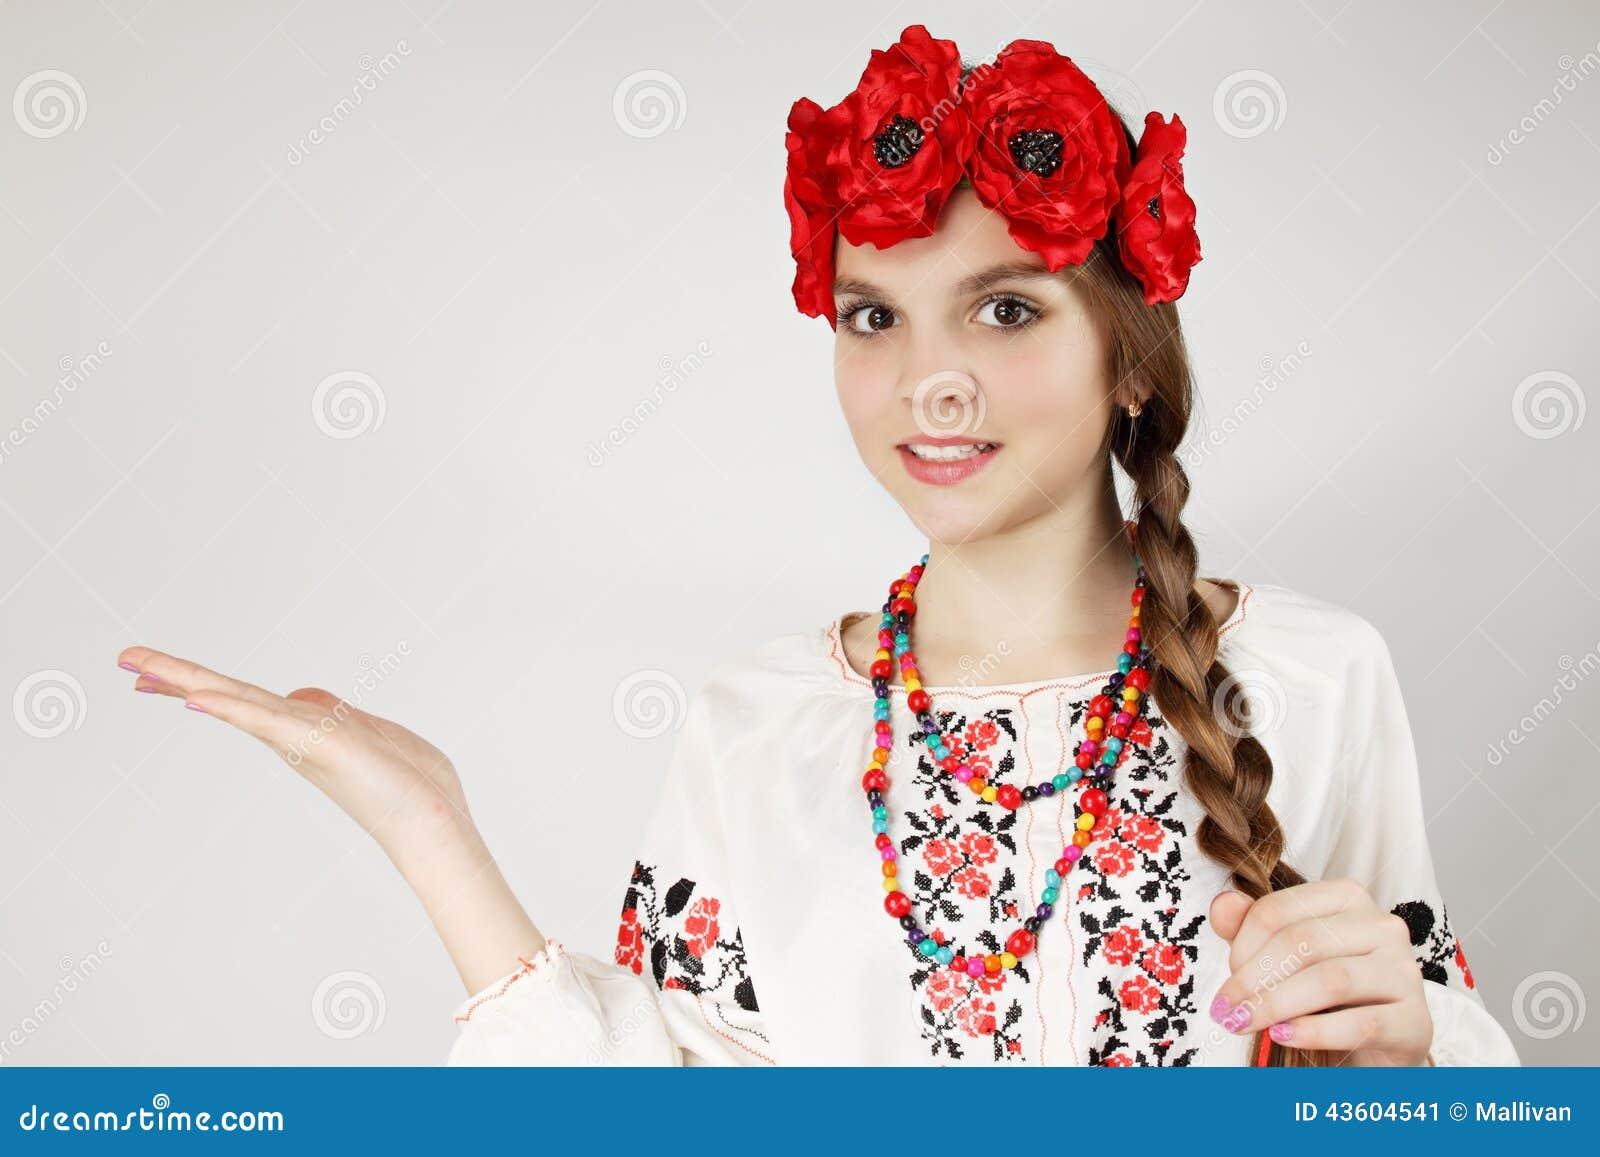 At Hand Ukrainian Women 10